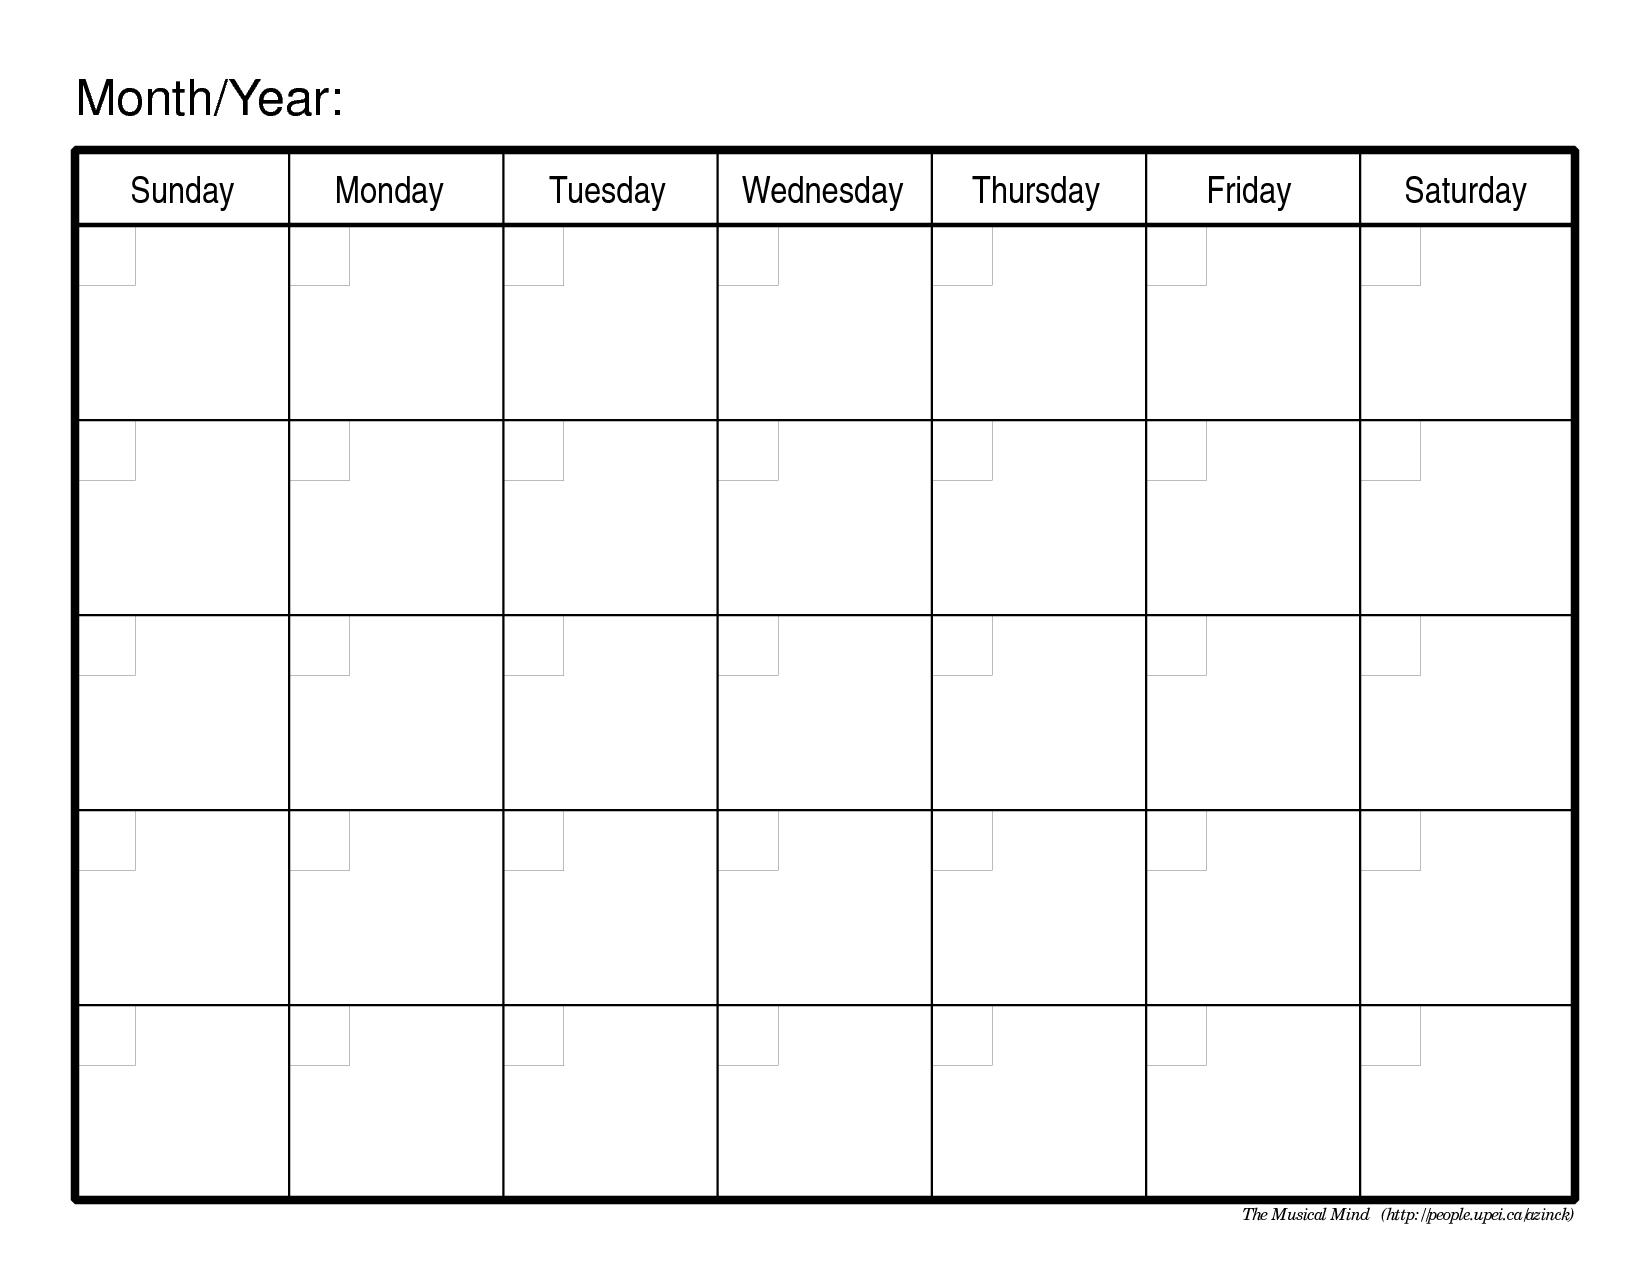 Free Printable Calendar For My Running Schedule September Monthly - Free Printable Monthly Planner